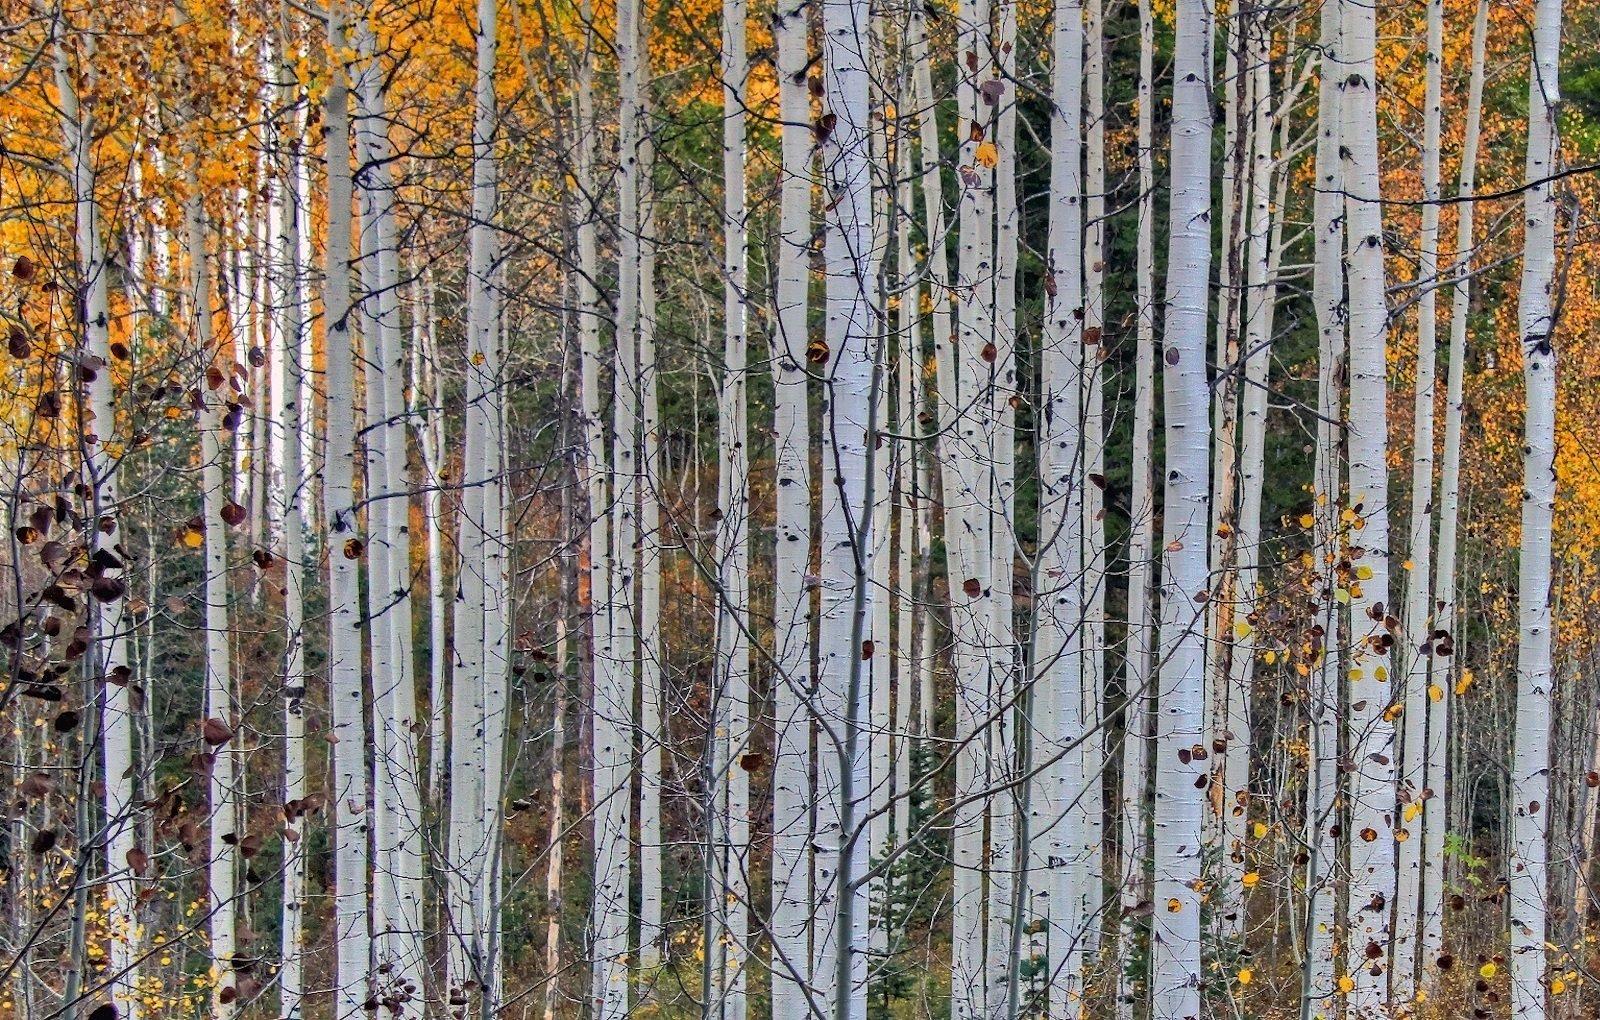 Lumpkin Park Apartments Columbus Muscogee Georgia 31903 aspen trees